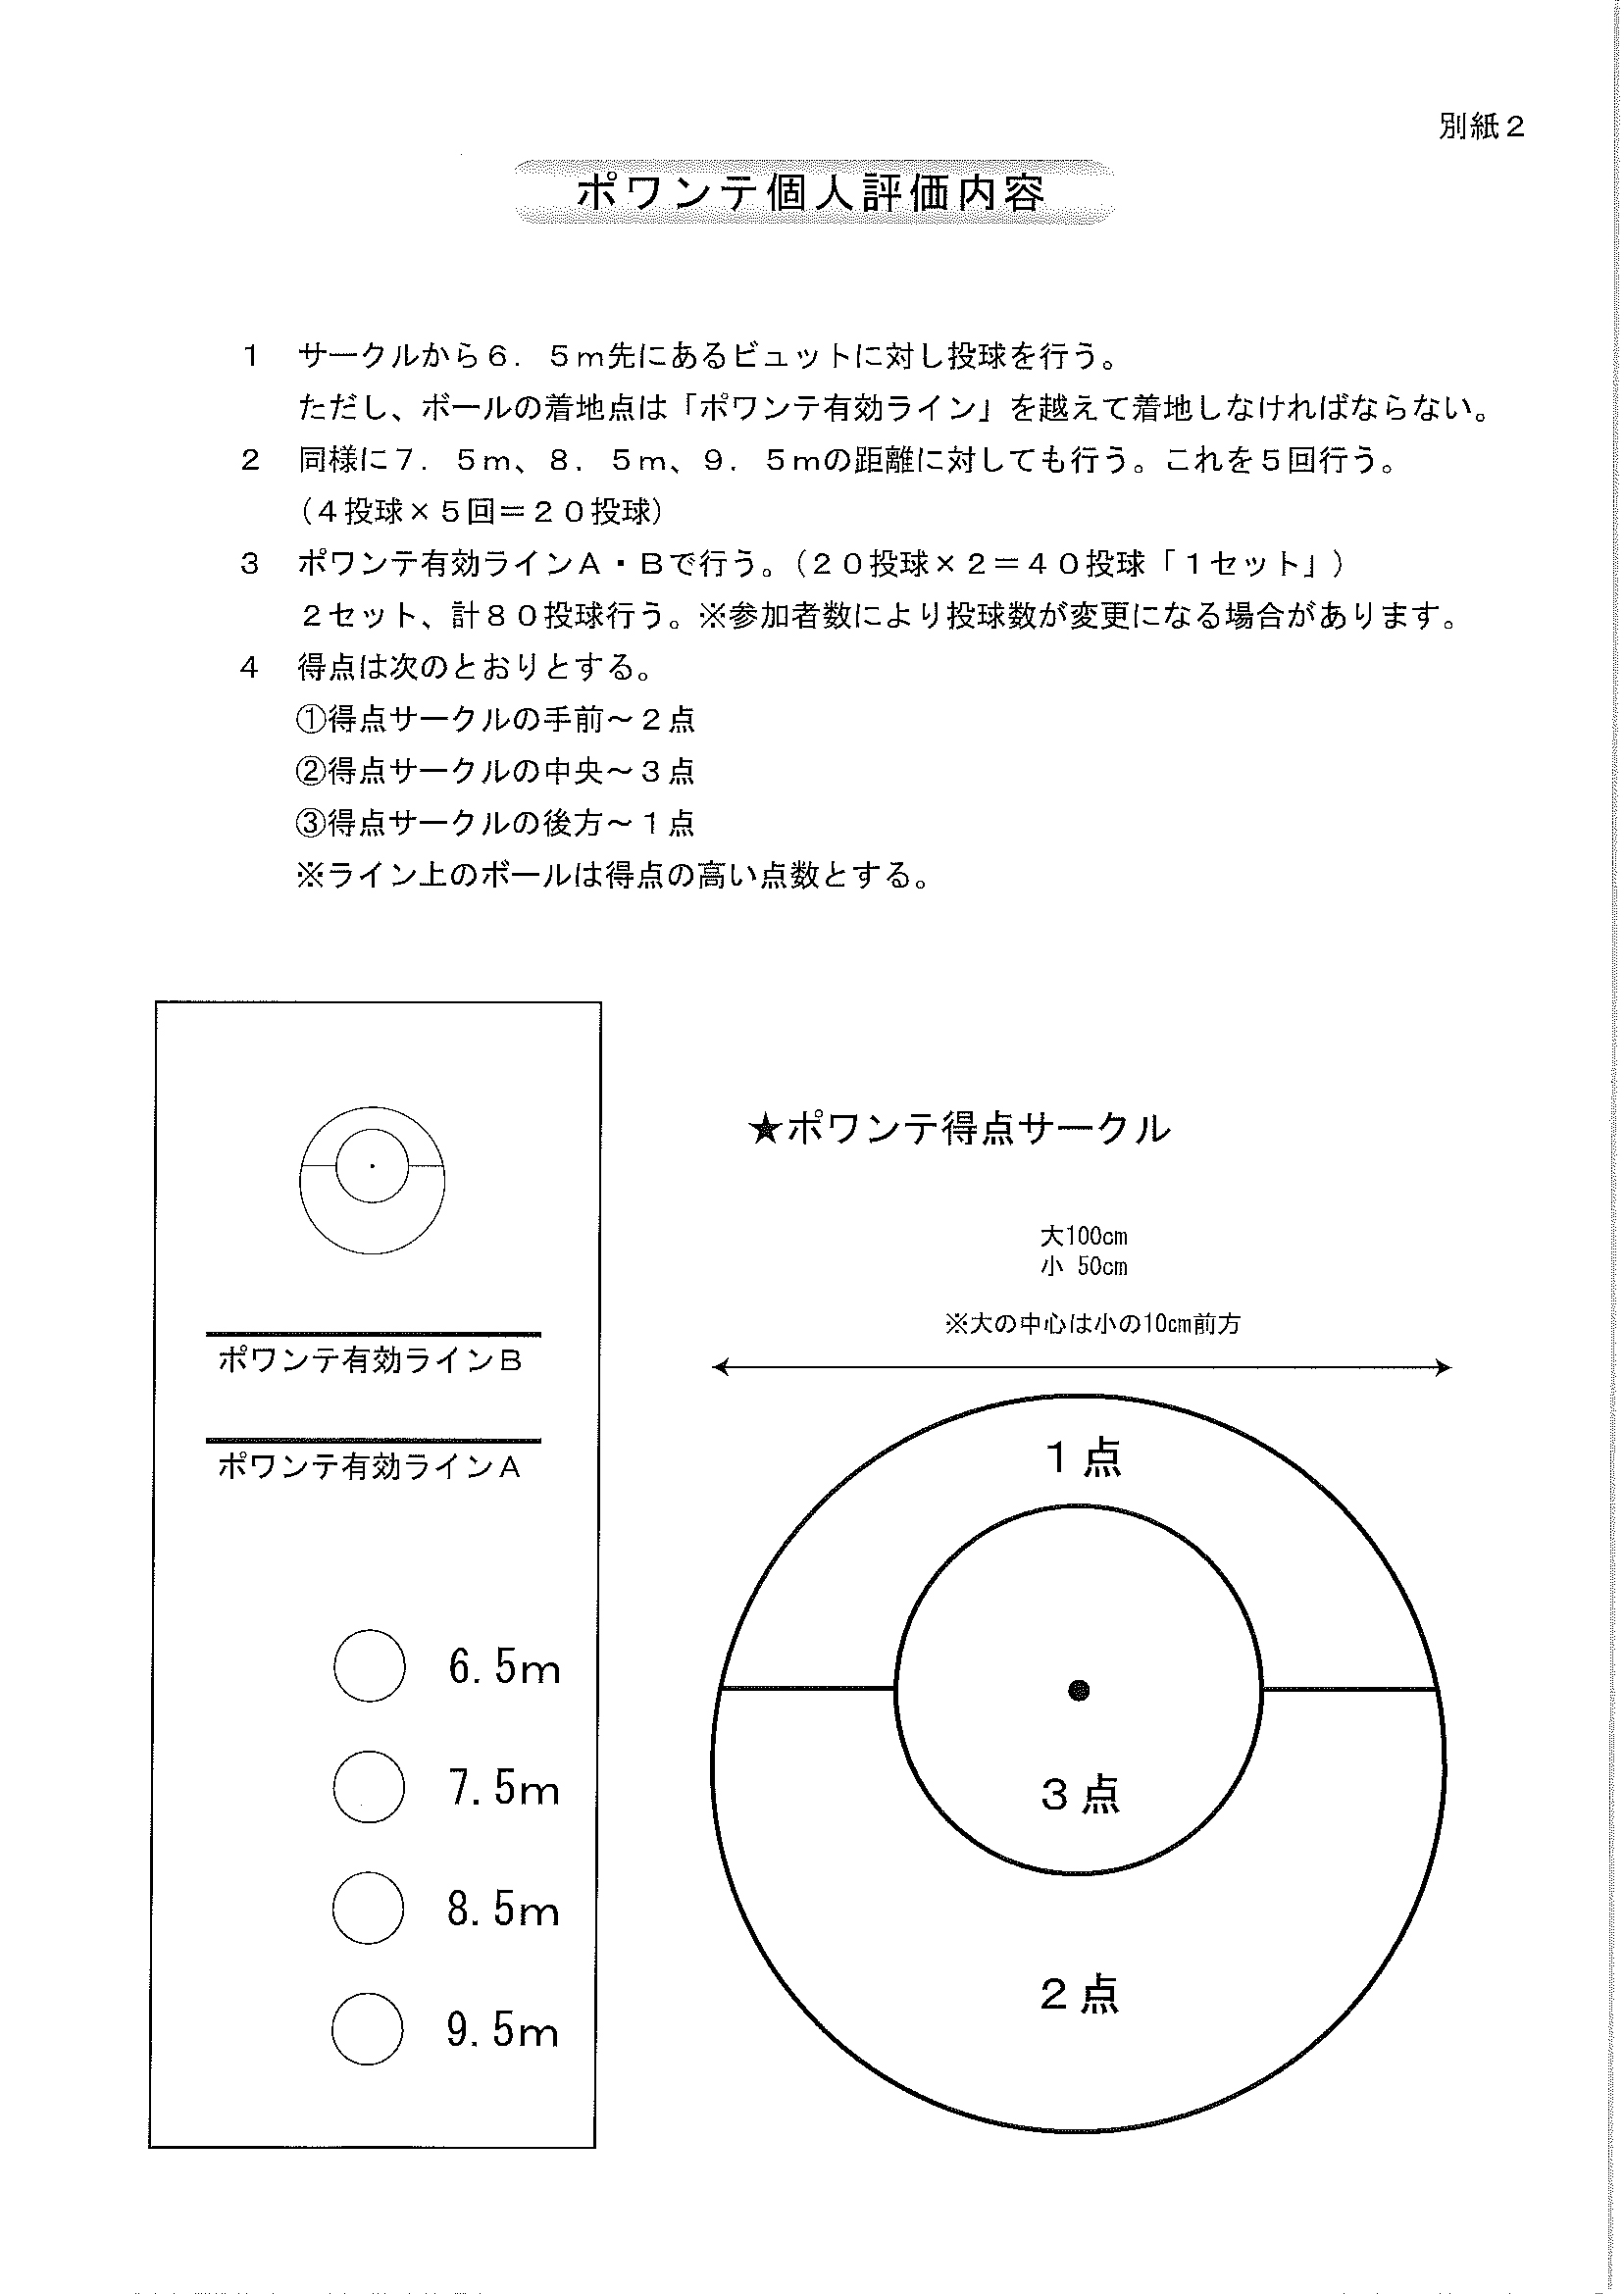 1senkoukai1.jpg